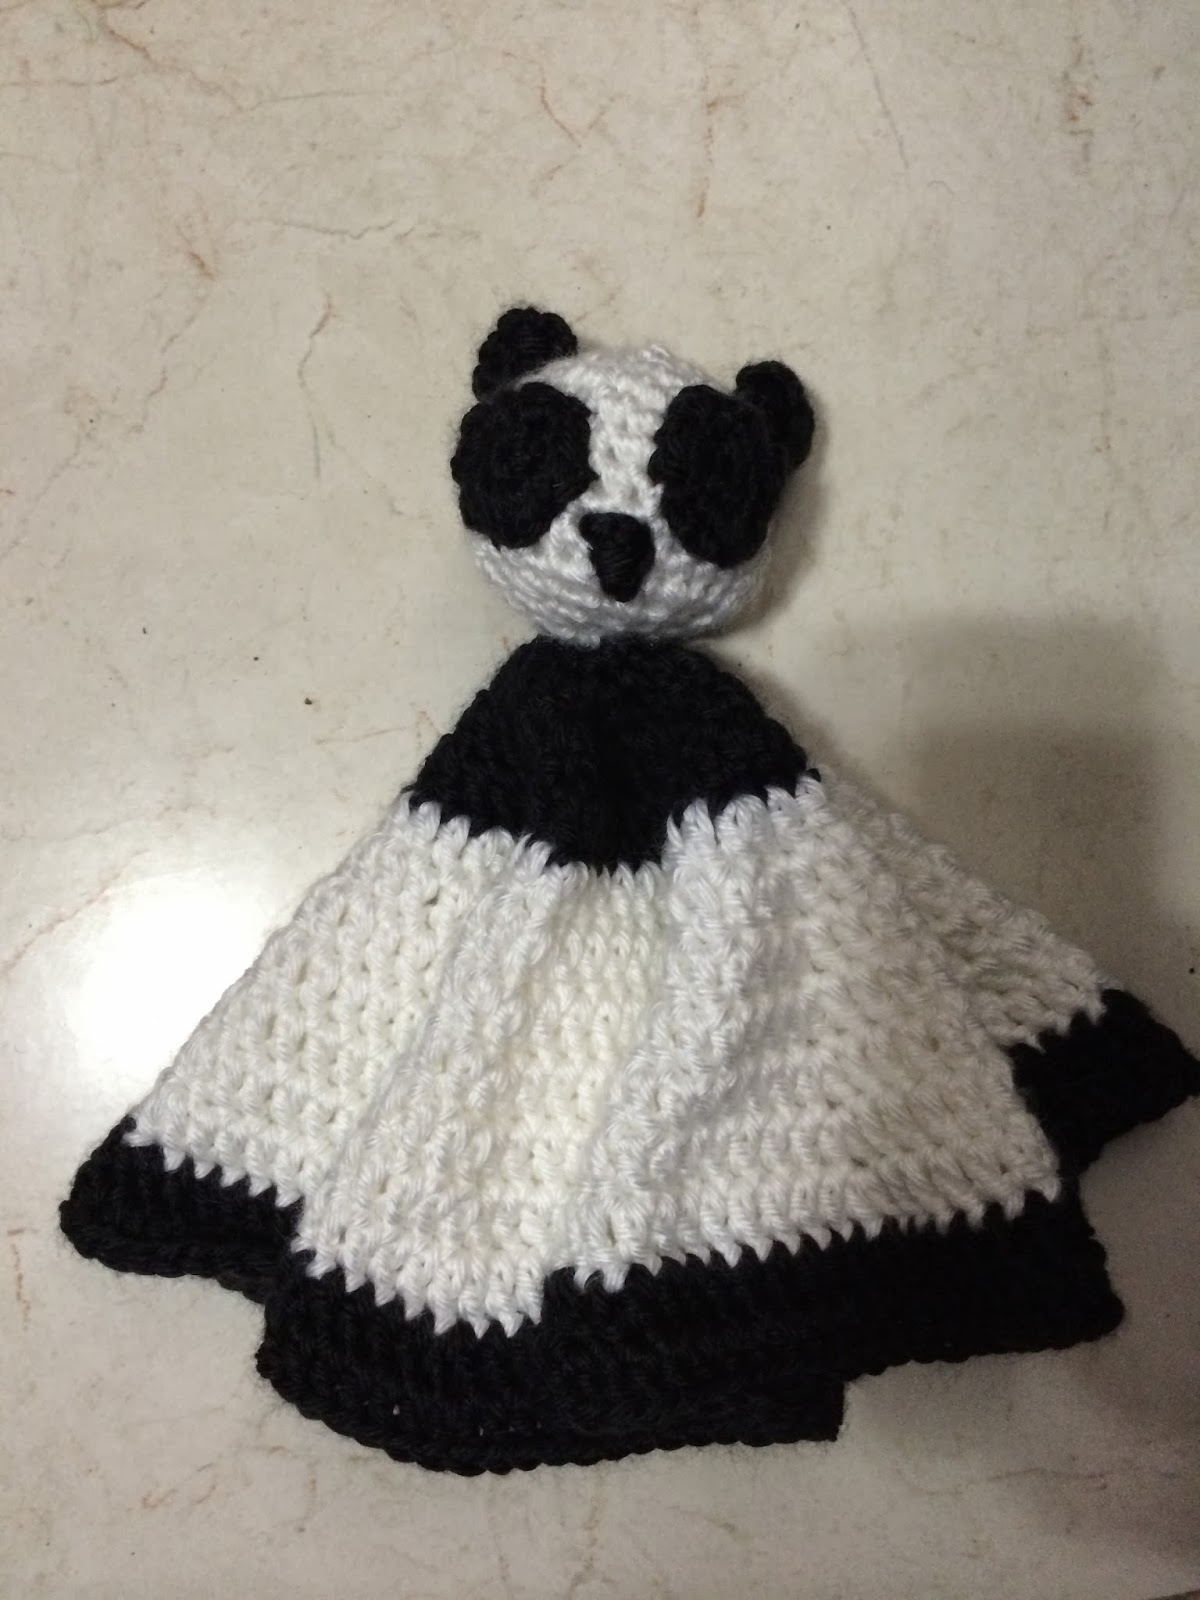 Crochet Panda Baby Security Blanket | Not My Nana\'s Crochet!